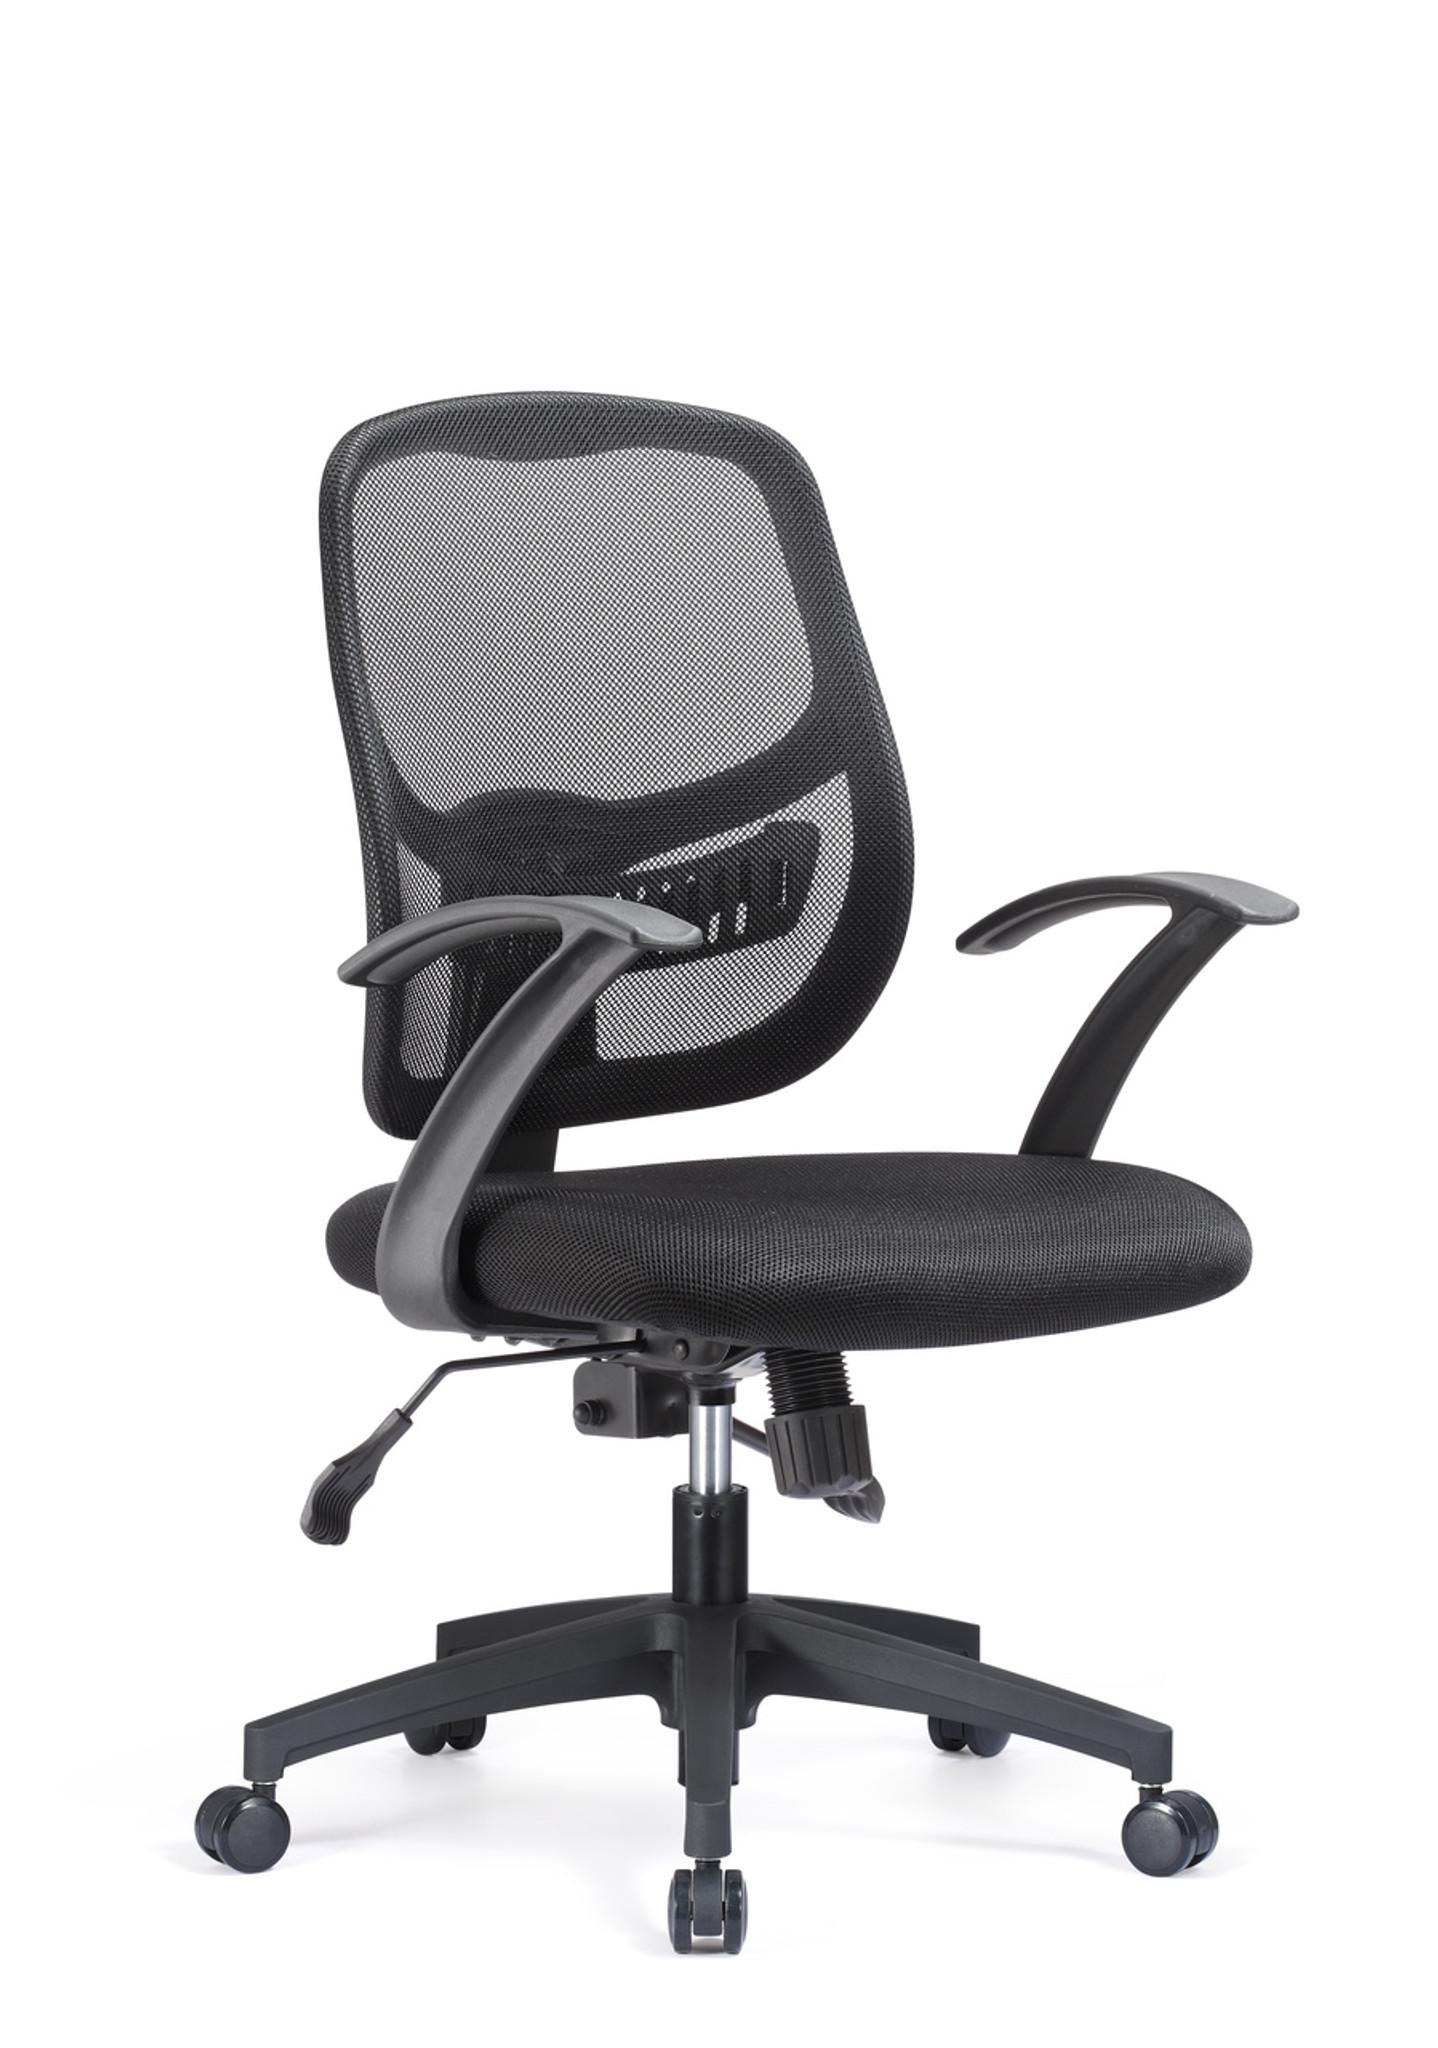 Modern Design Adjustable Height Office Chair Mesh - Orlando Office ...